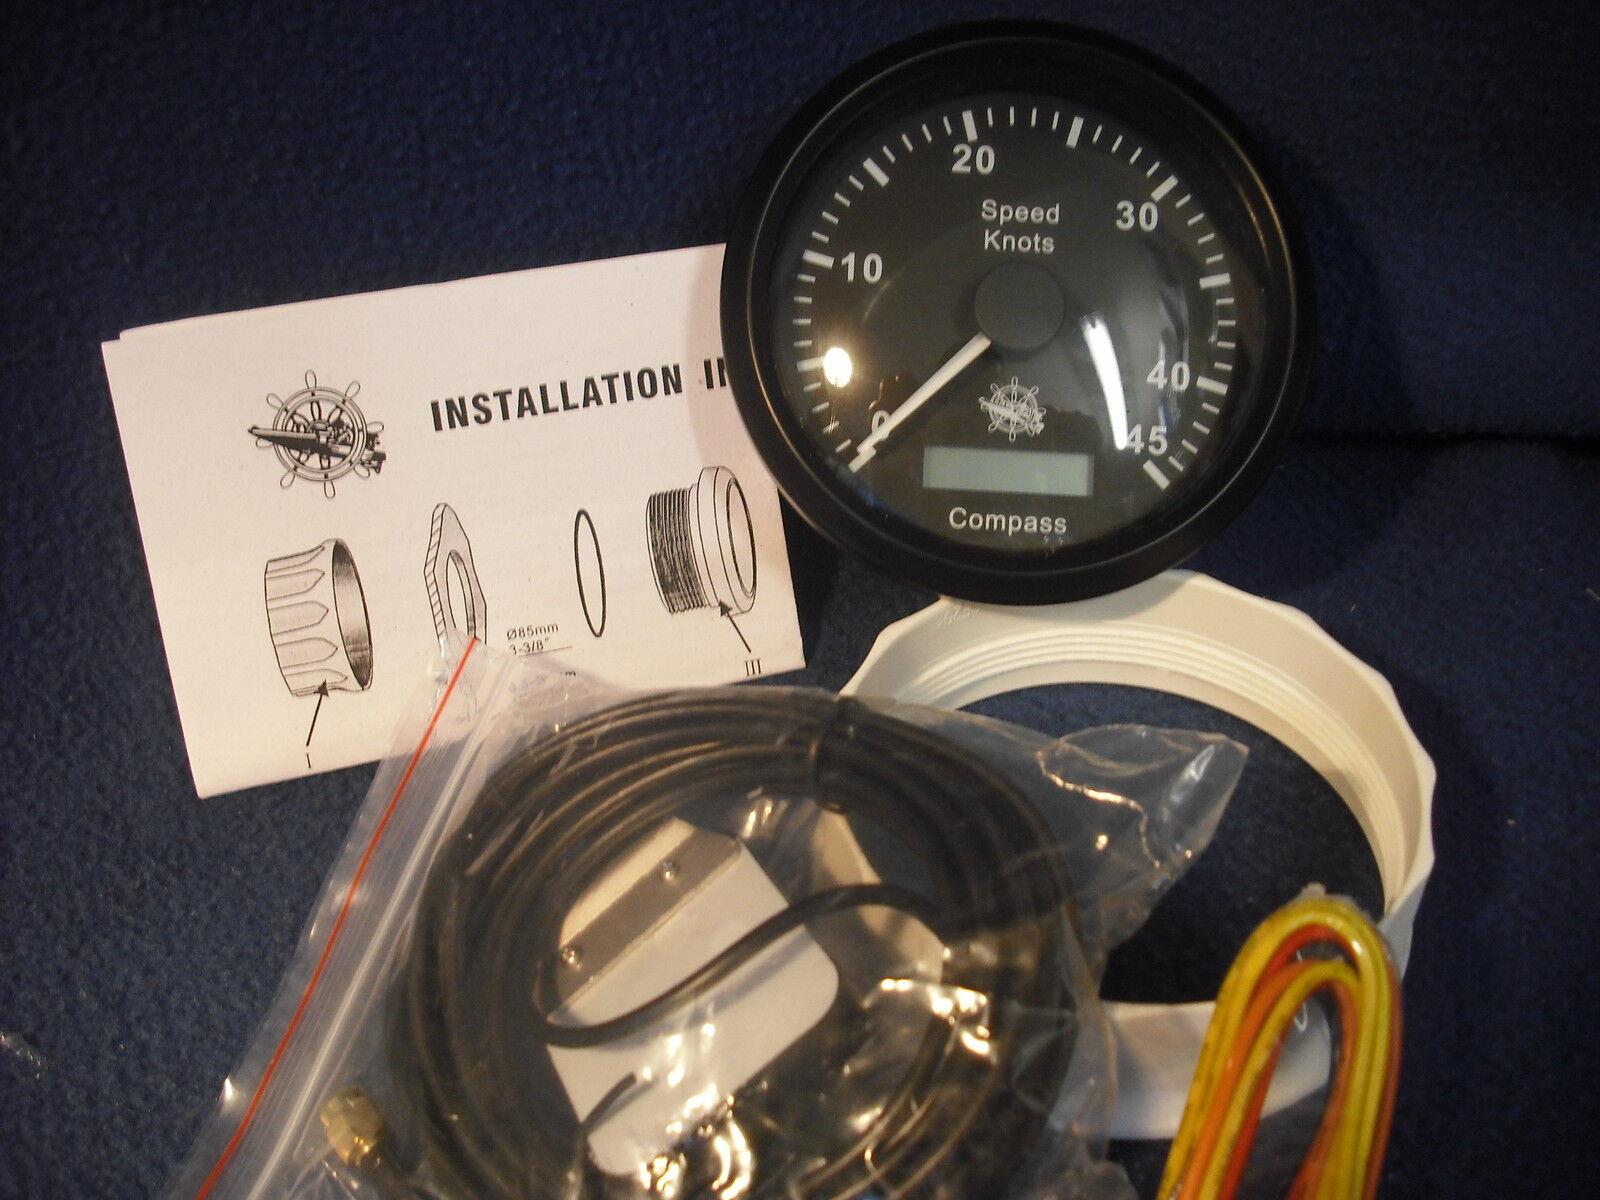 GUARDIAN Geschwindikeitsmesser GPS Kompass mit GPS Geschwindikeitsmesser schwarz 27.780.02 26f8bb